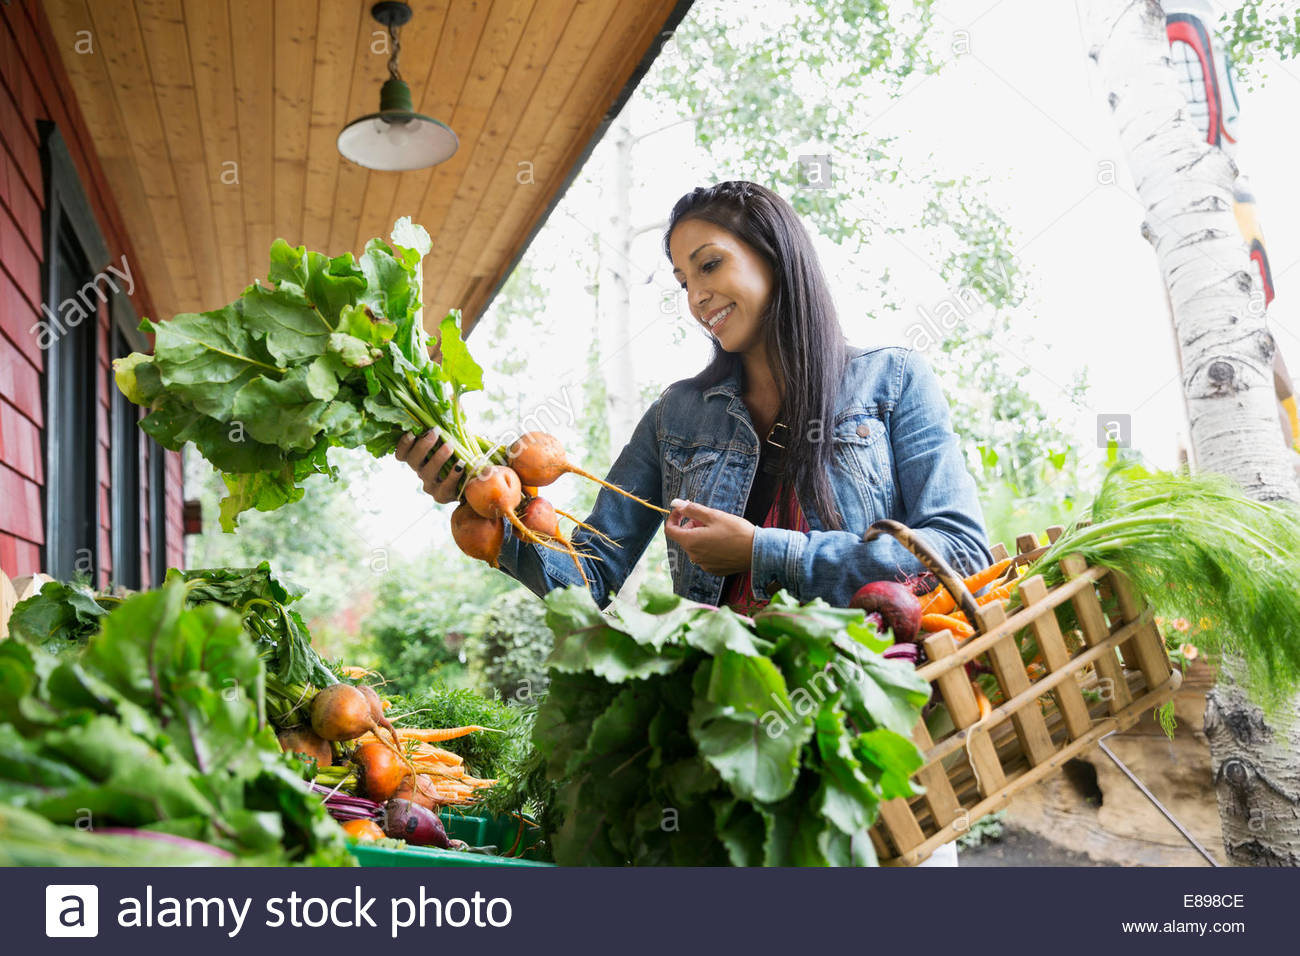 Woman shopping for fresh produce outside market - Stock Image